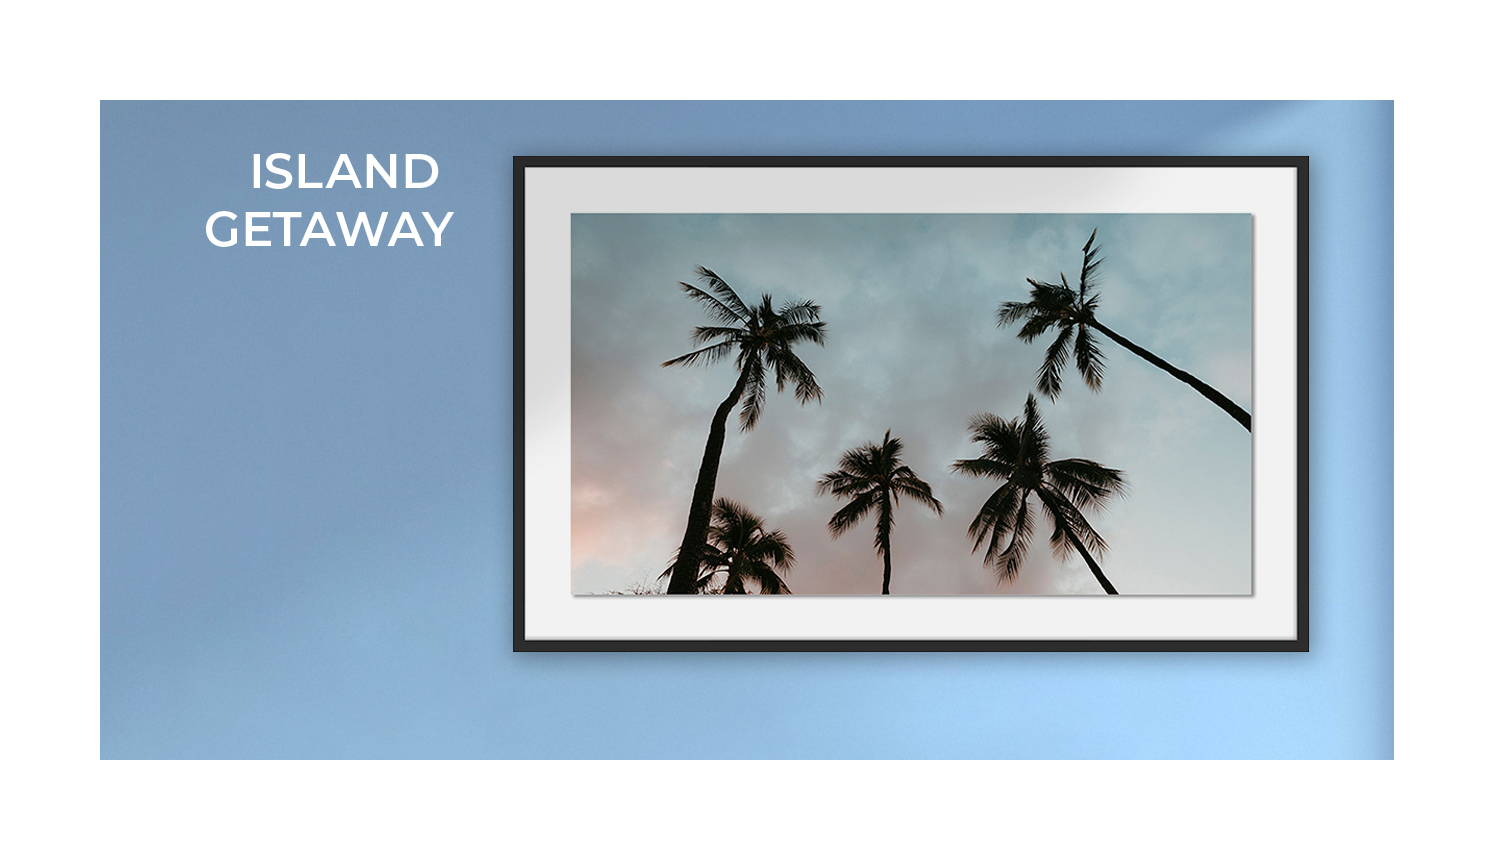 islandgetaway.jpg